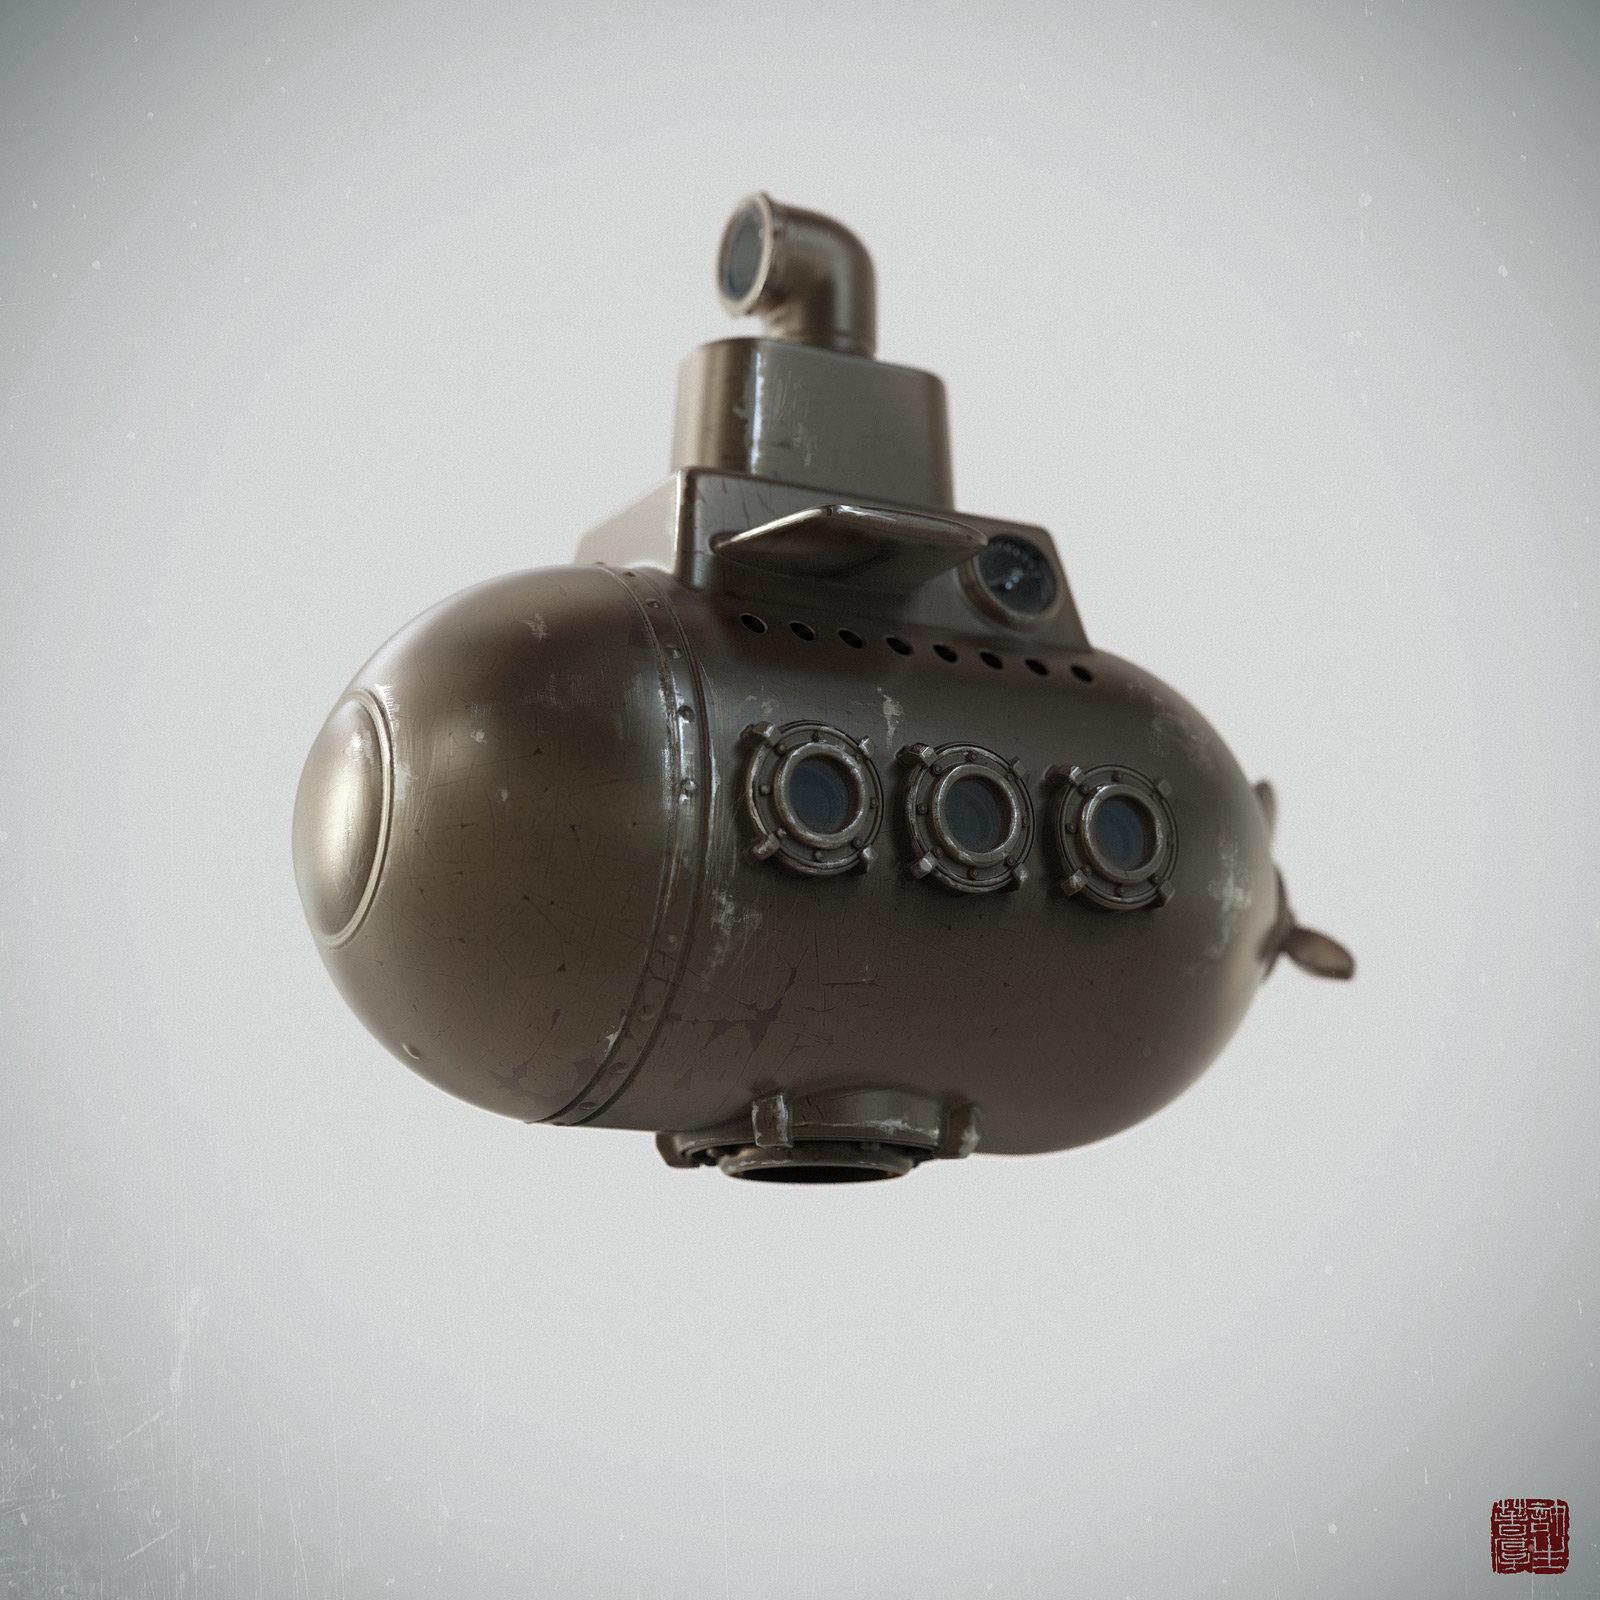 Zhelong xu submarine